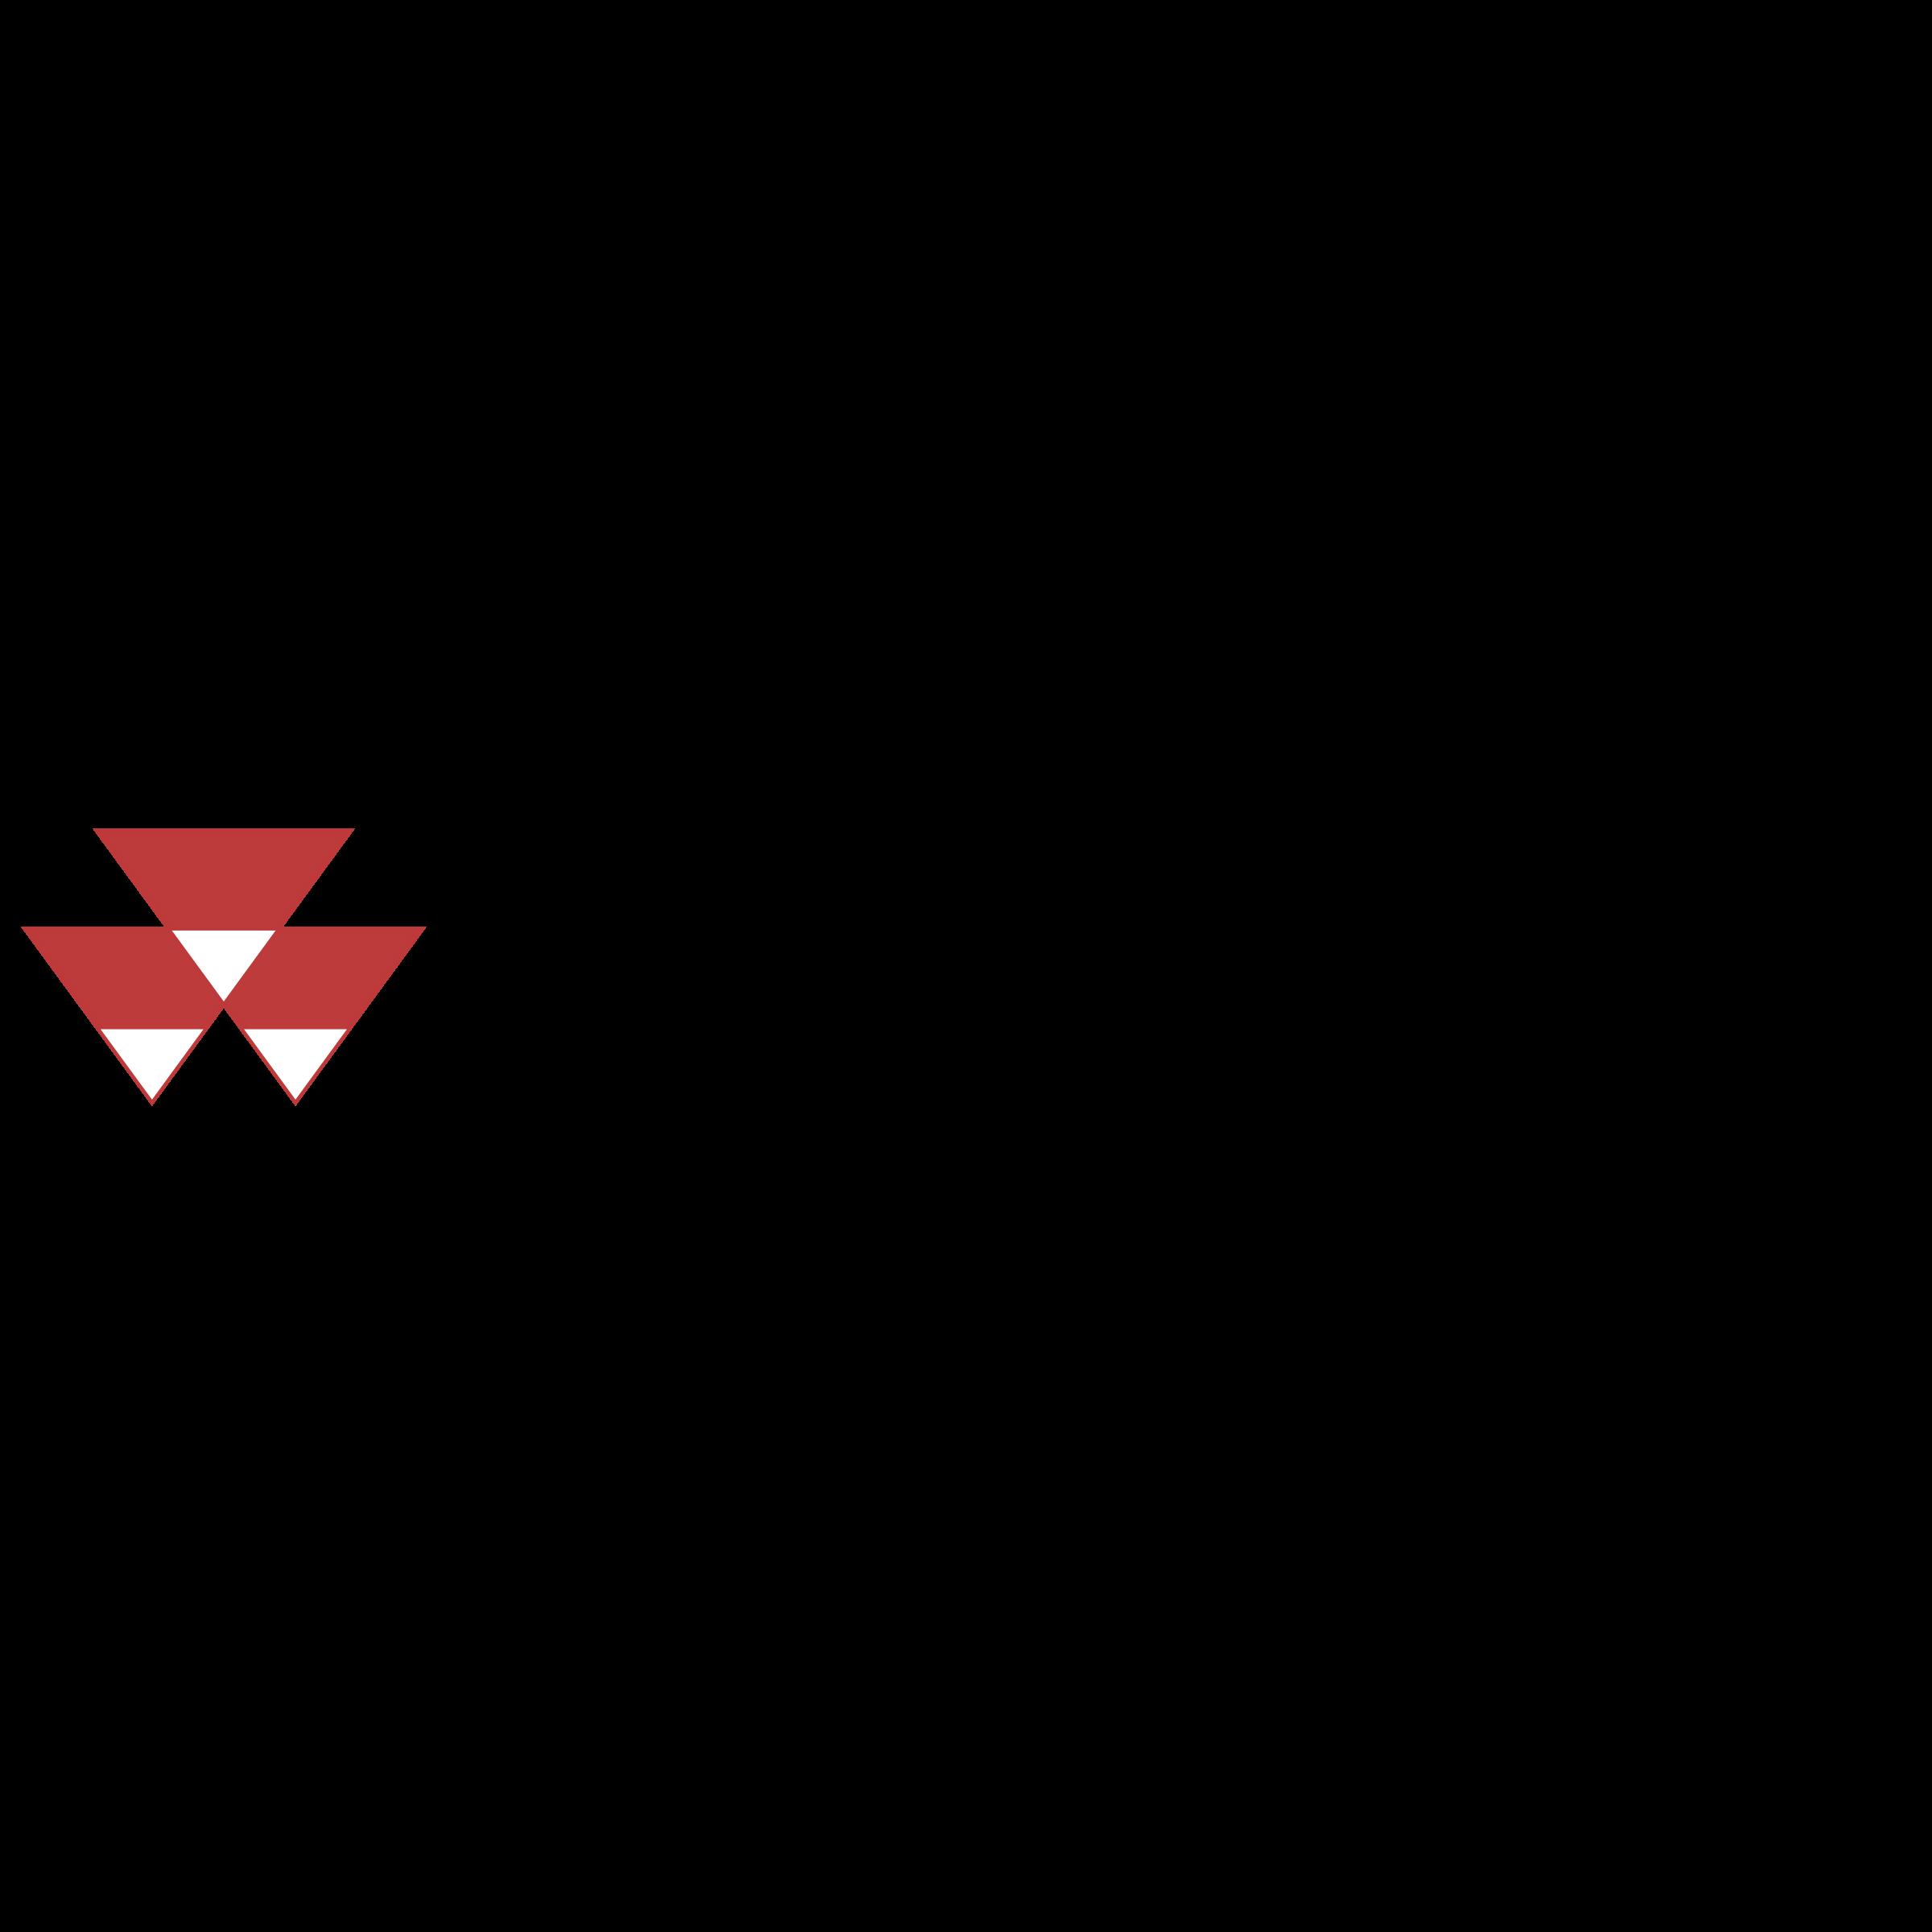 Massey Ferguson Logo PNG Transparent & SVG Vector - Freebie Supply